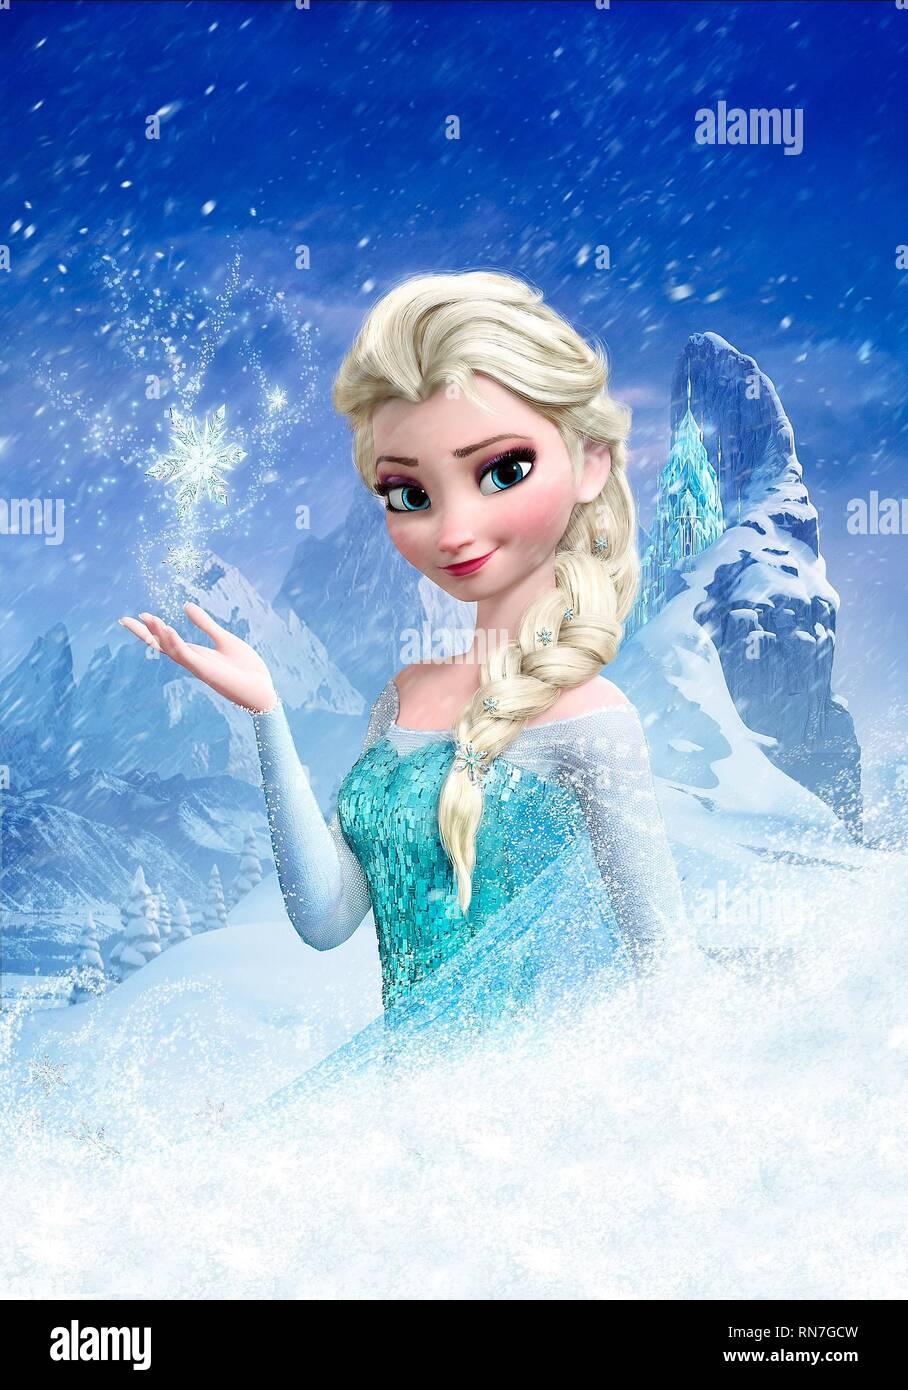 469409ae3d8 Frozen Film Stock Photos   Frozen Film Stock Images - Alamy